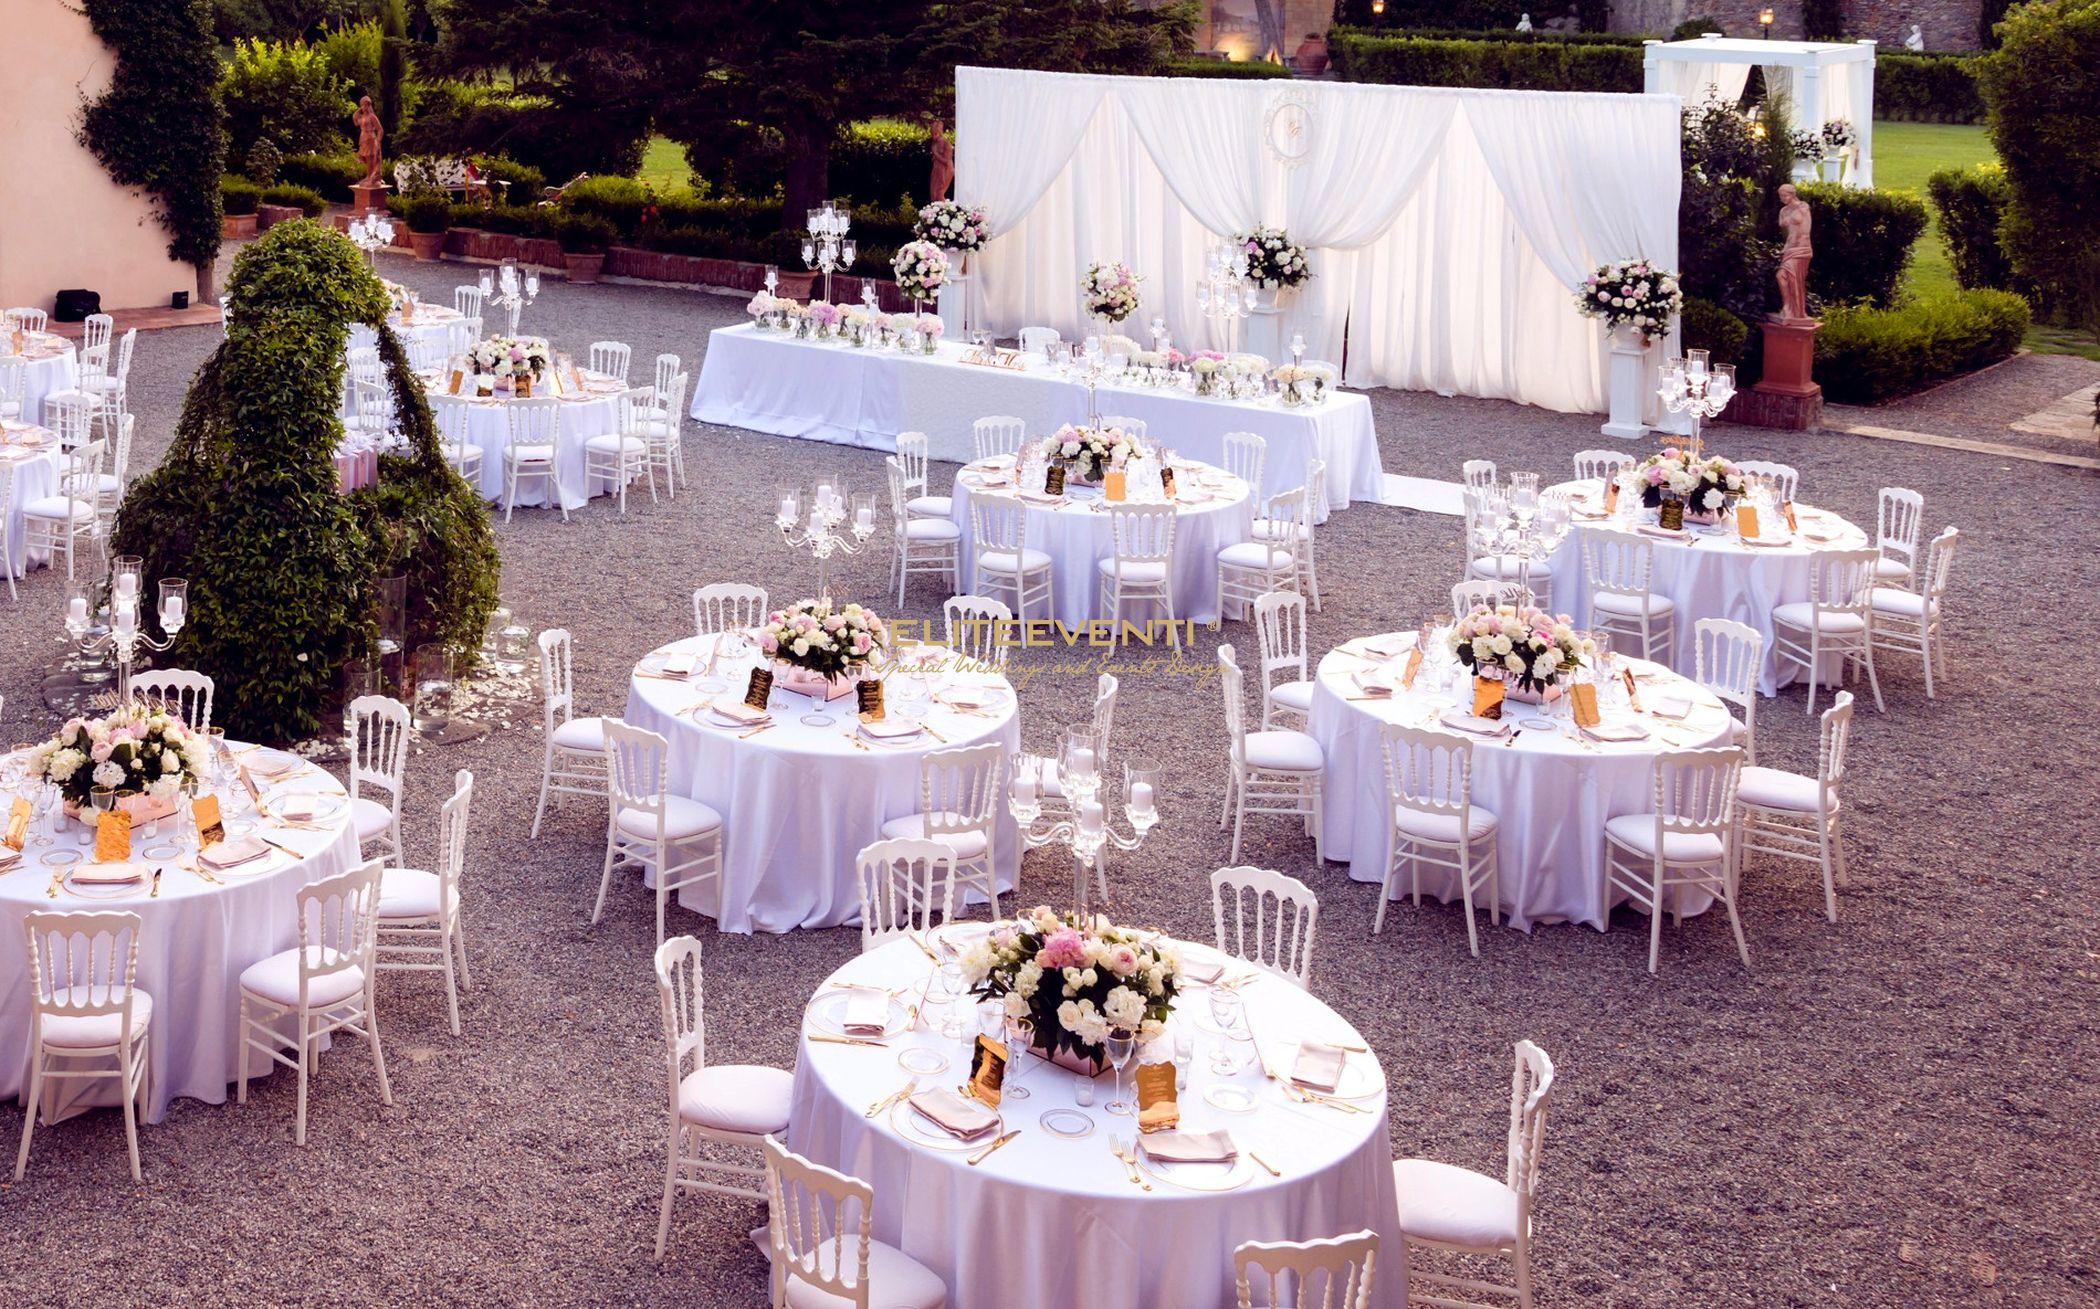 Matrimonio Da Sogno Toscana : Midsummer night s dream wedding eliteeventi